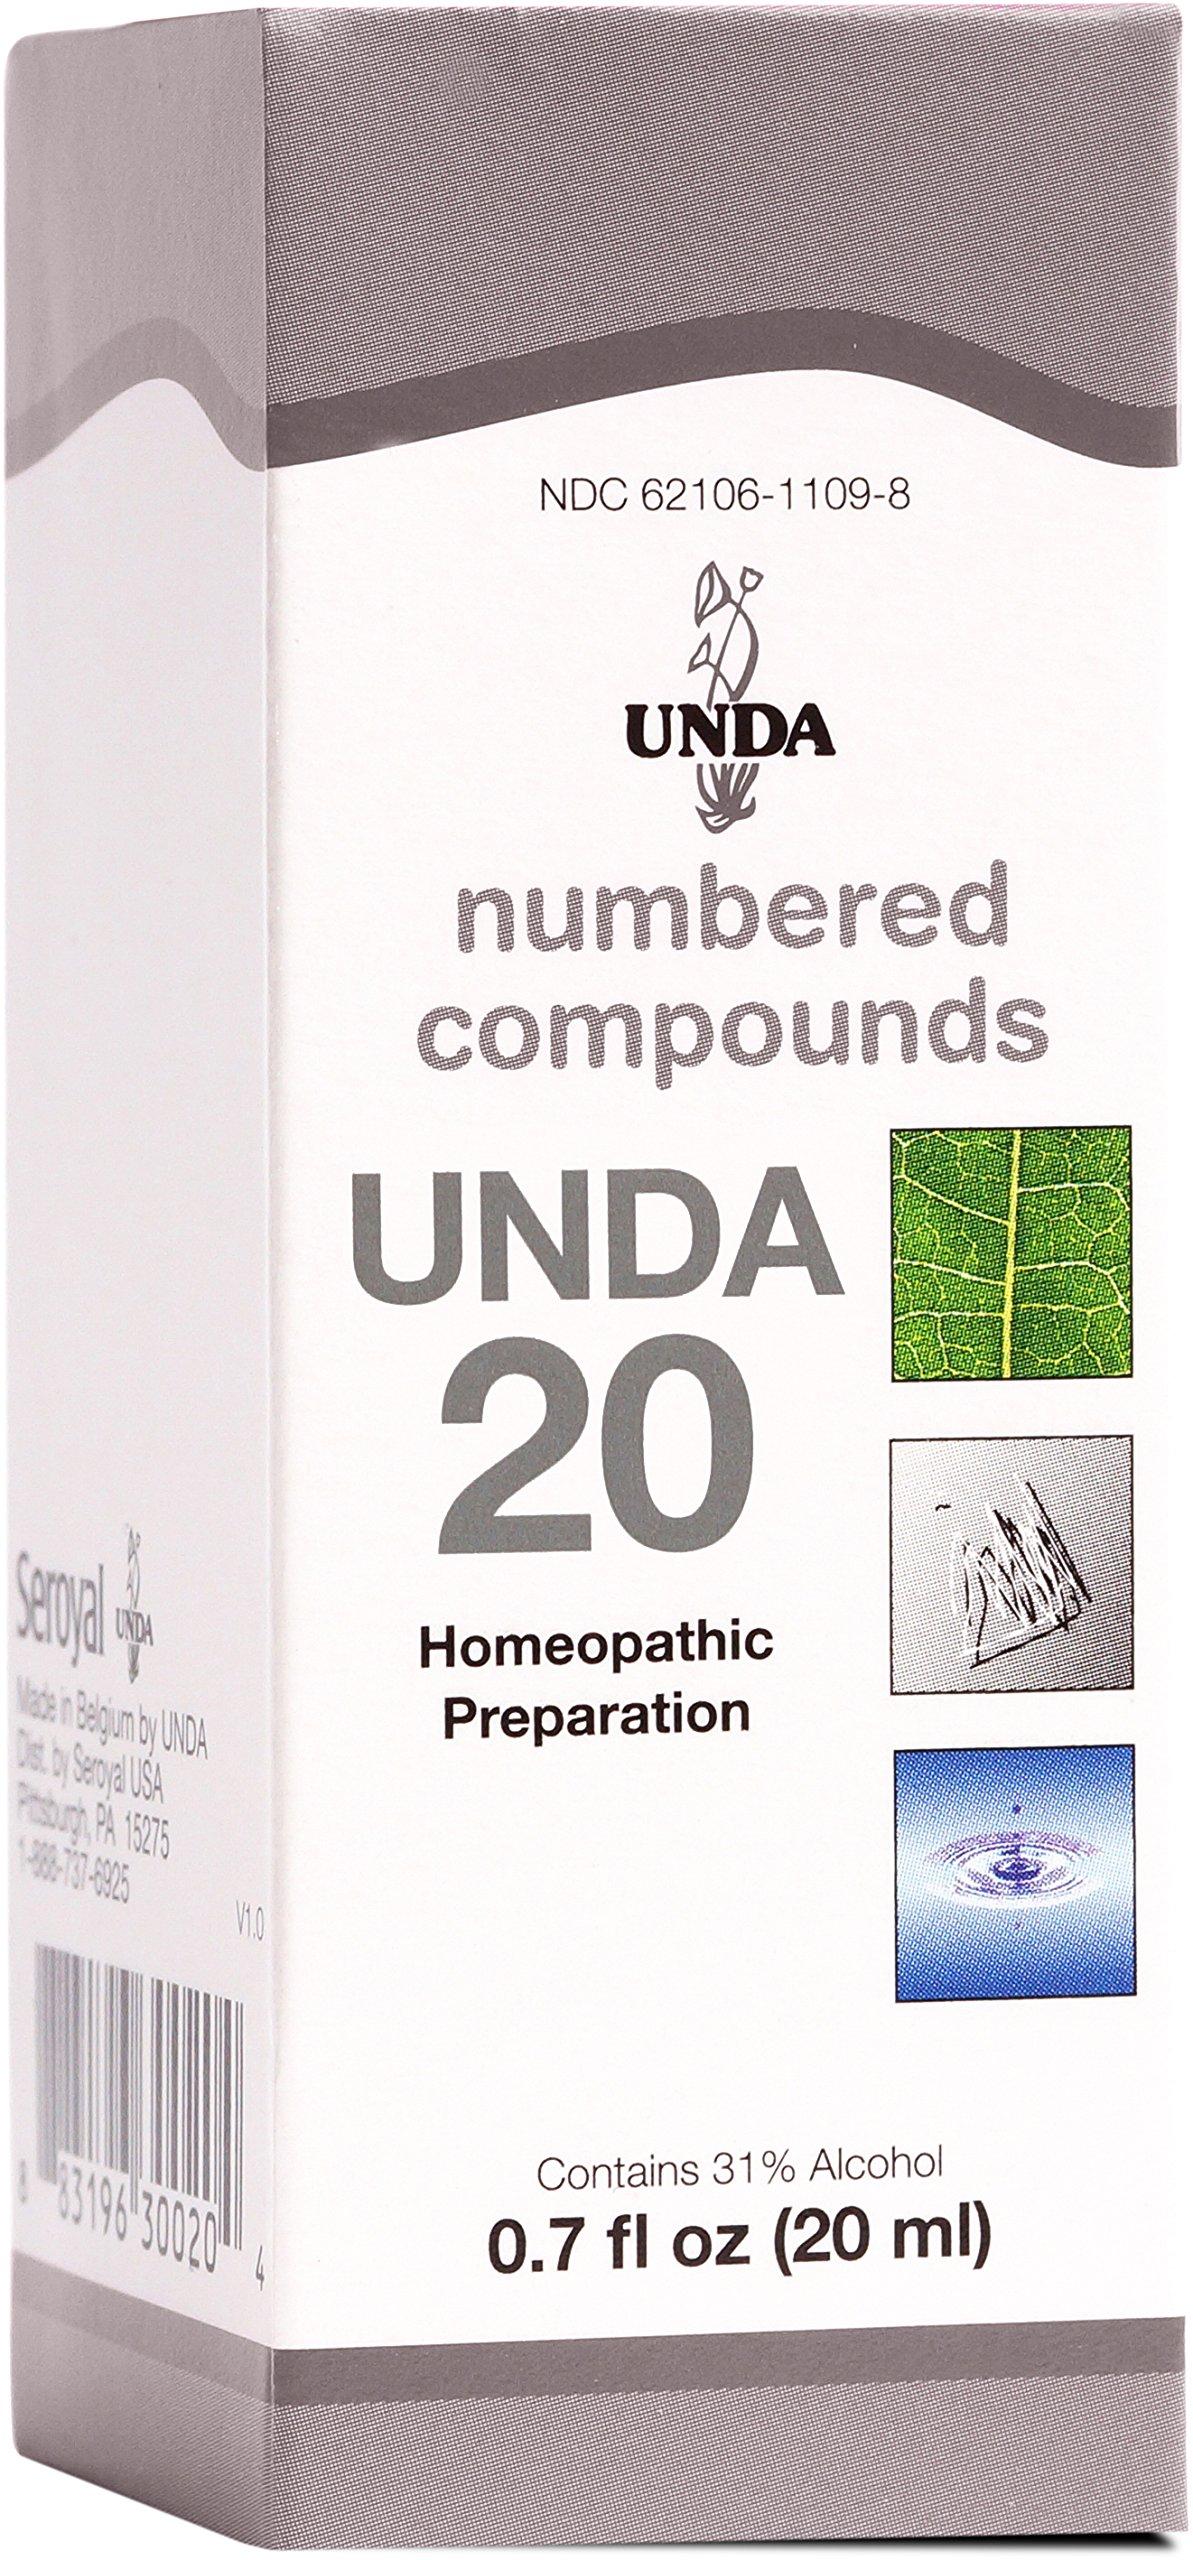 UNDA - UNDA 20 Numbered Compounds - Homeopathic Preparation - 0.7 fl oz (20 ml) by UNDA